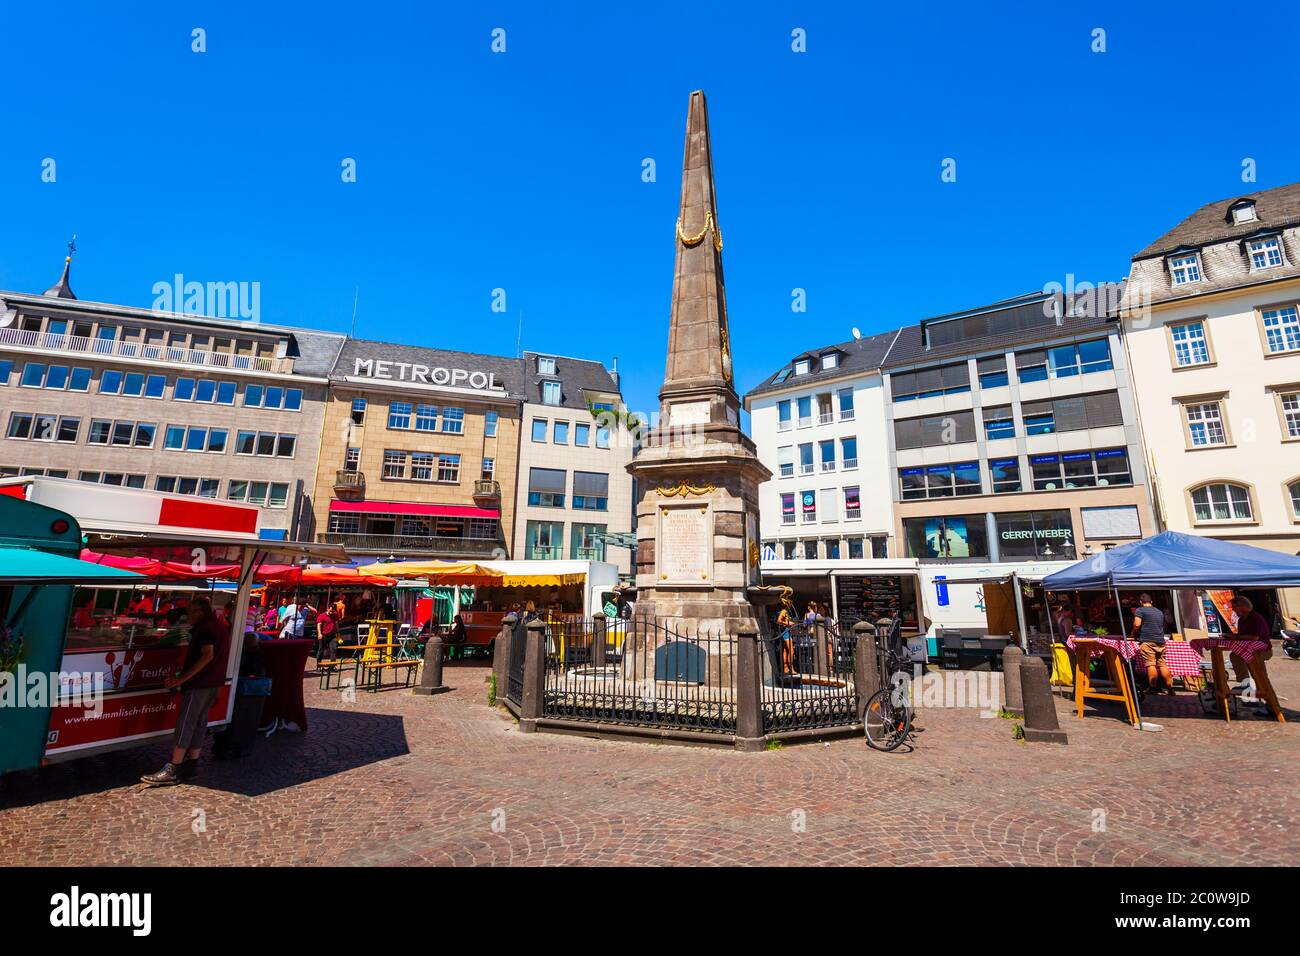 BONN, GERMANY - JUNE 29, 2018: Market square in the centre of Bonn city in Germany Stock Photo